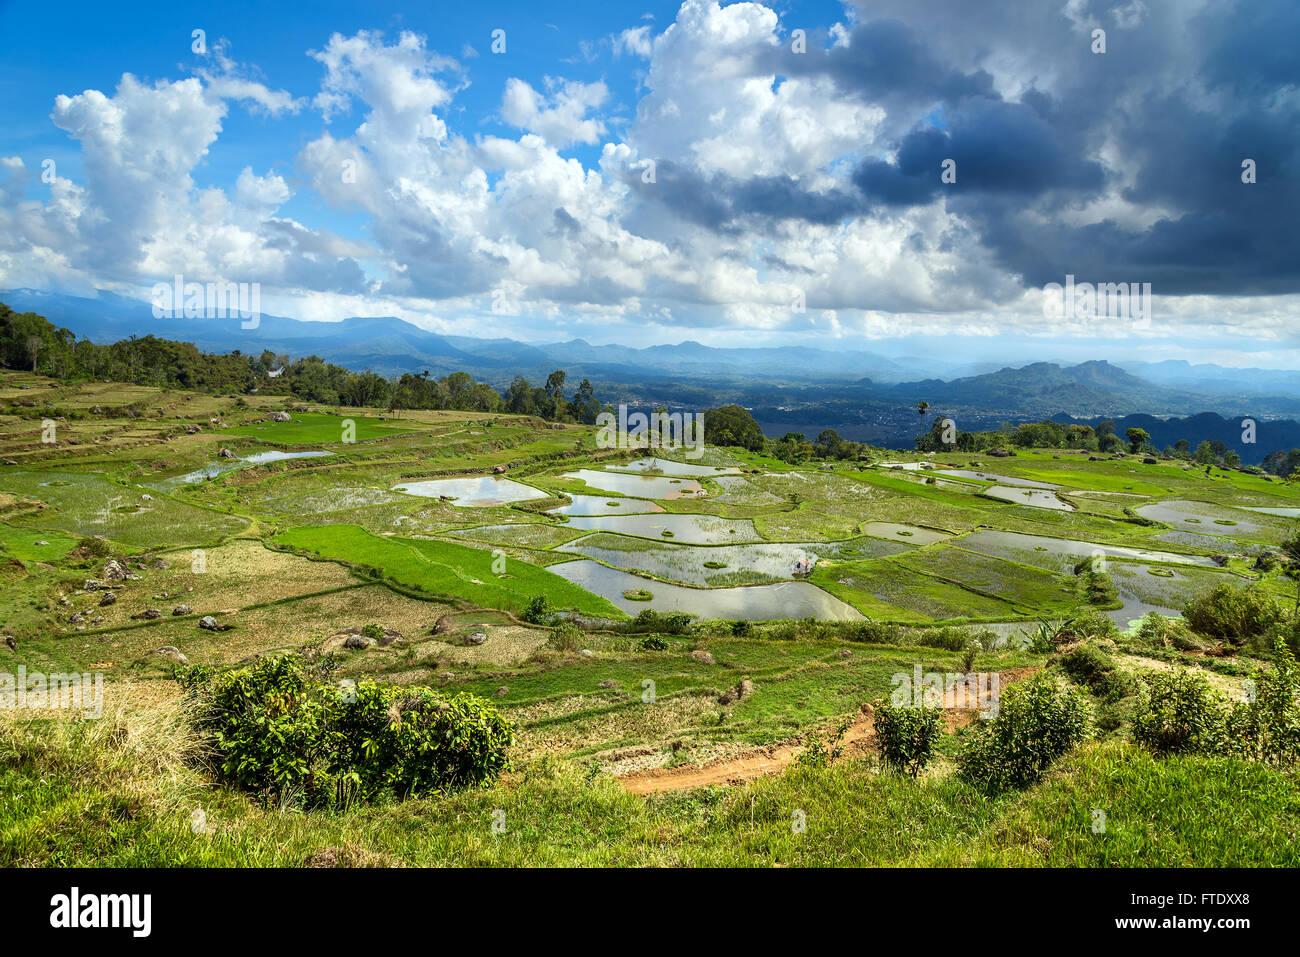 Green rice field terraces in Tana Toraja. South Sulawesi, Indonesia - Stock Image